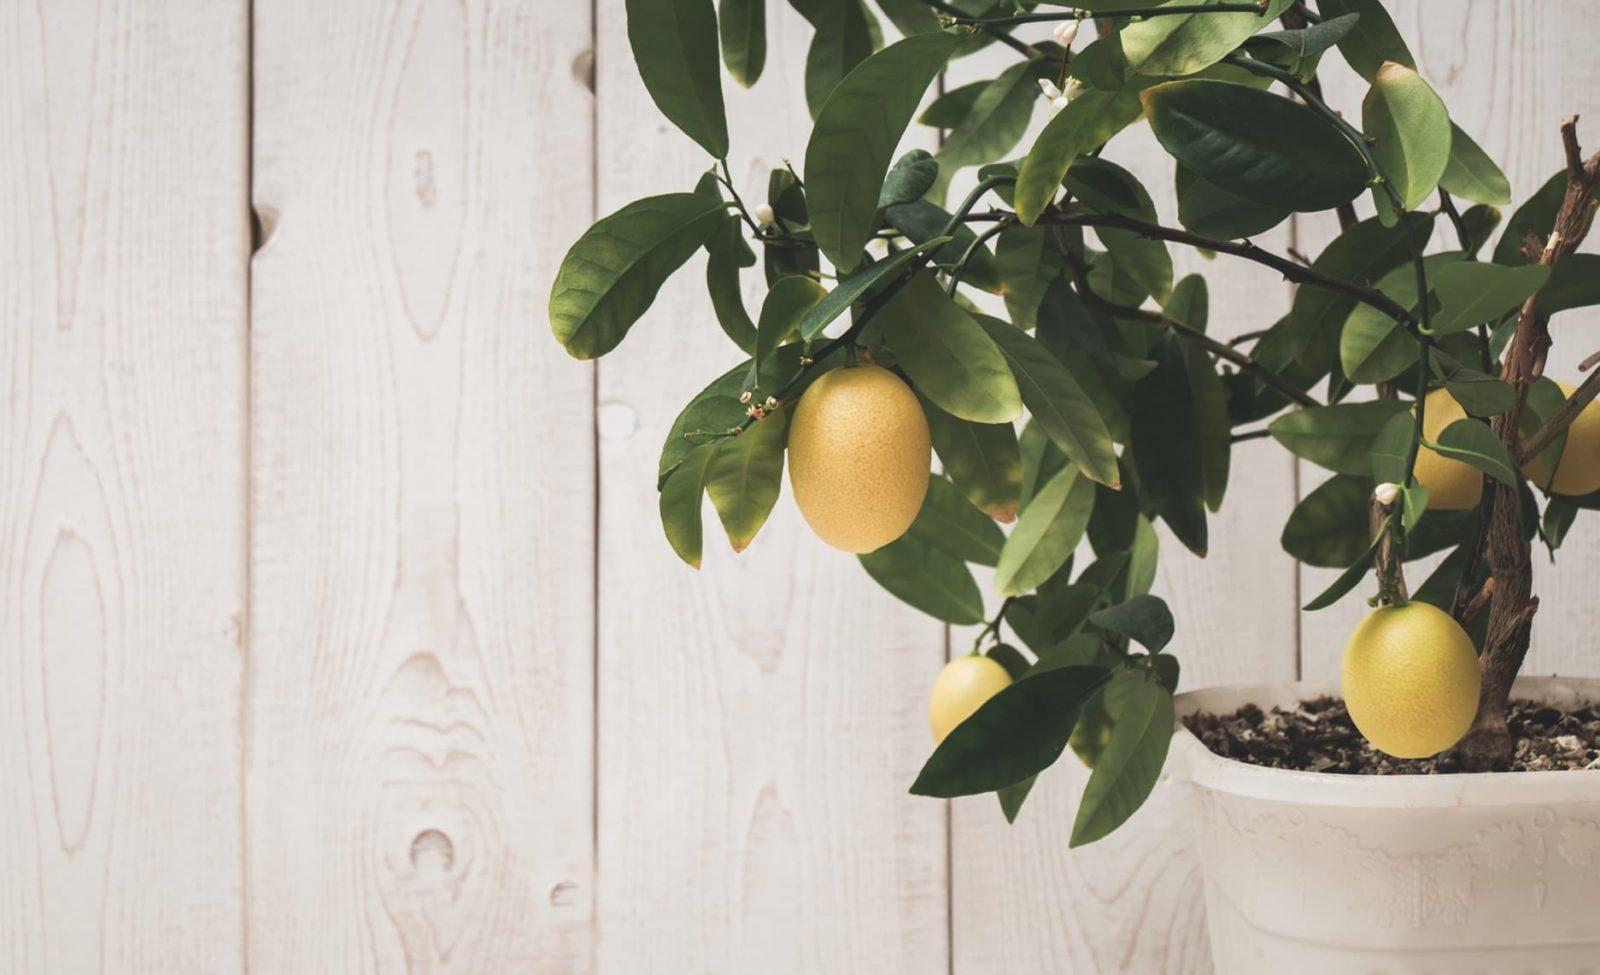 lemon tree in a grey pot growing indoors